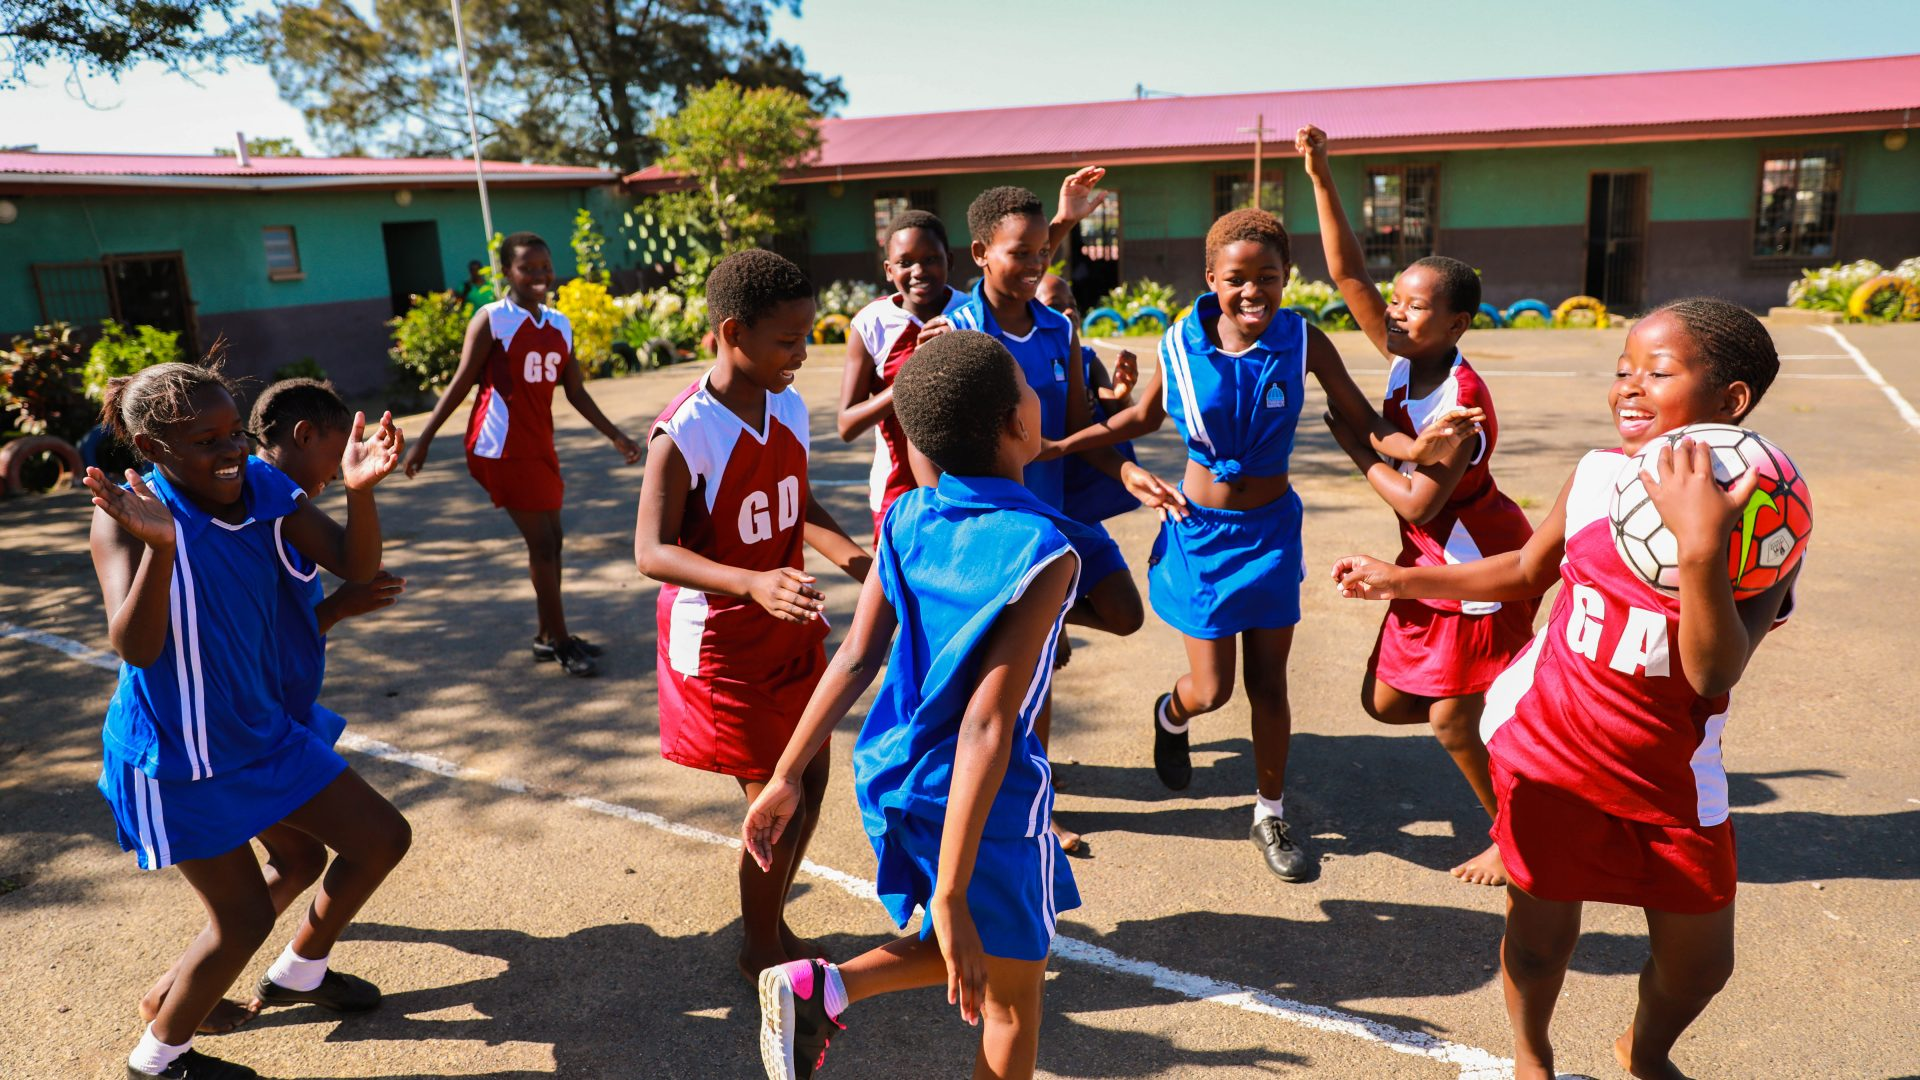 Girls playing netball